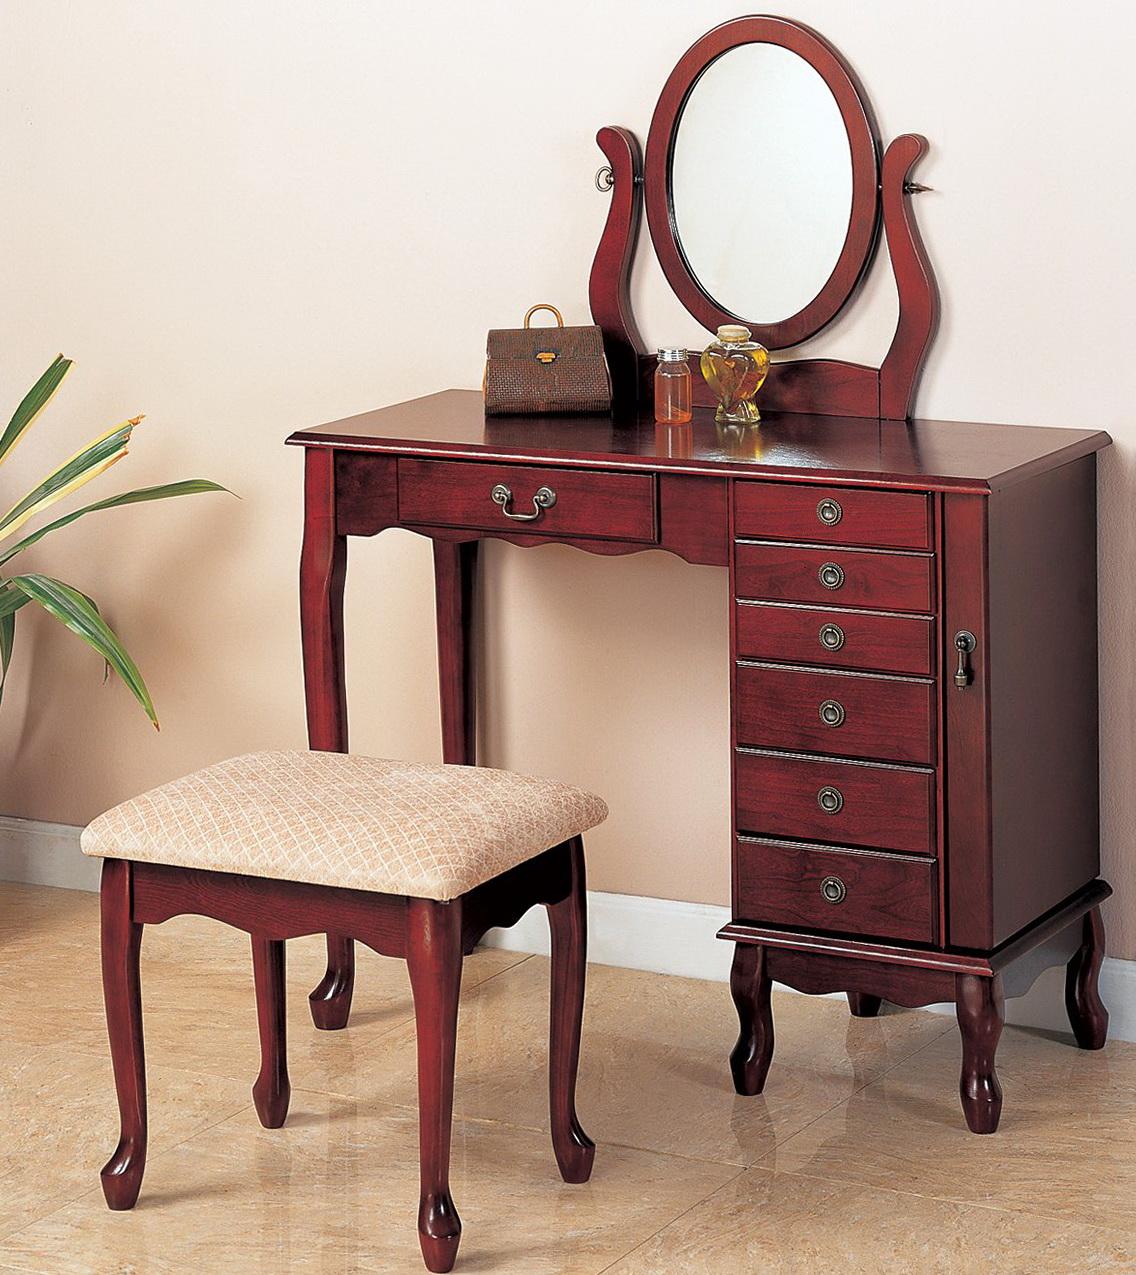 Bedroom Vanity Sets Under $100 | Home Design Ideas